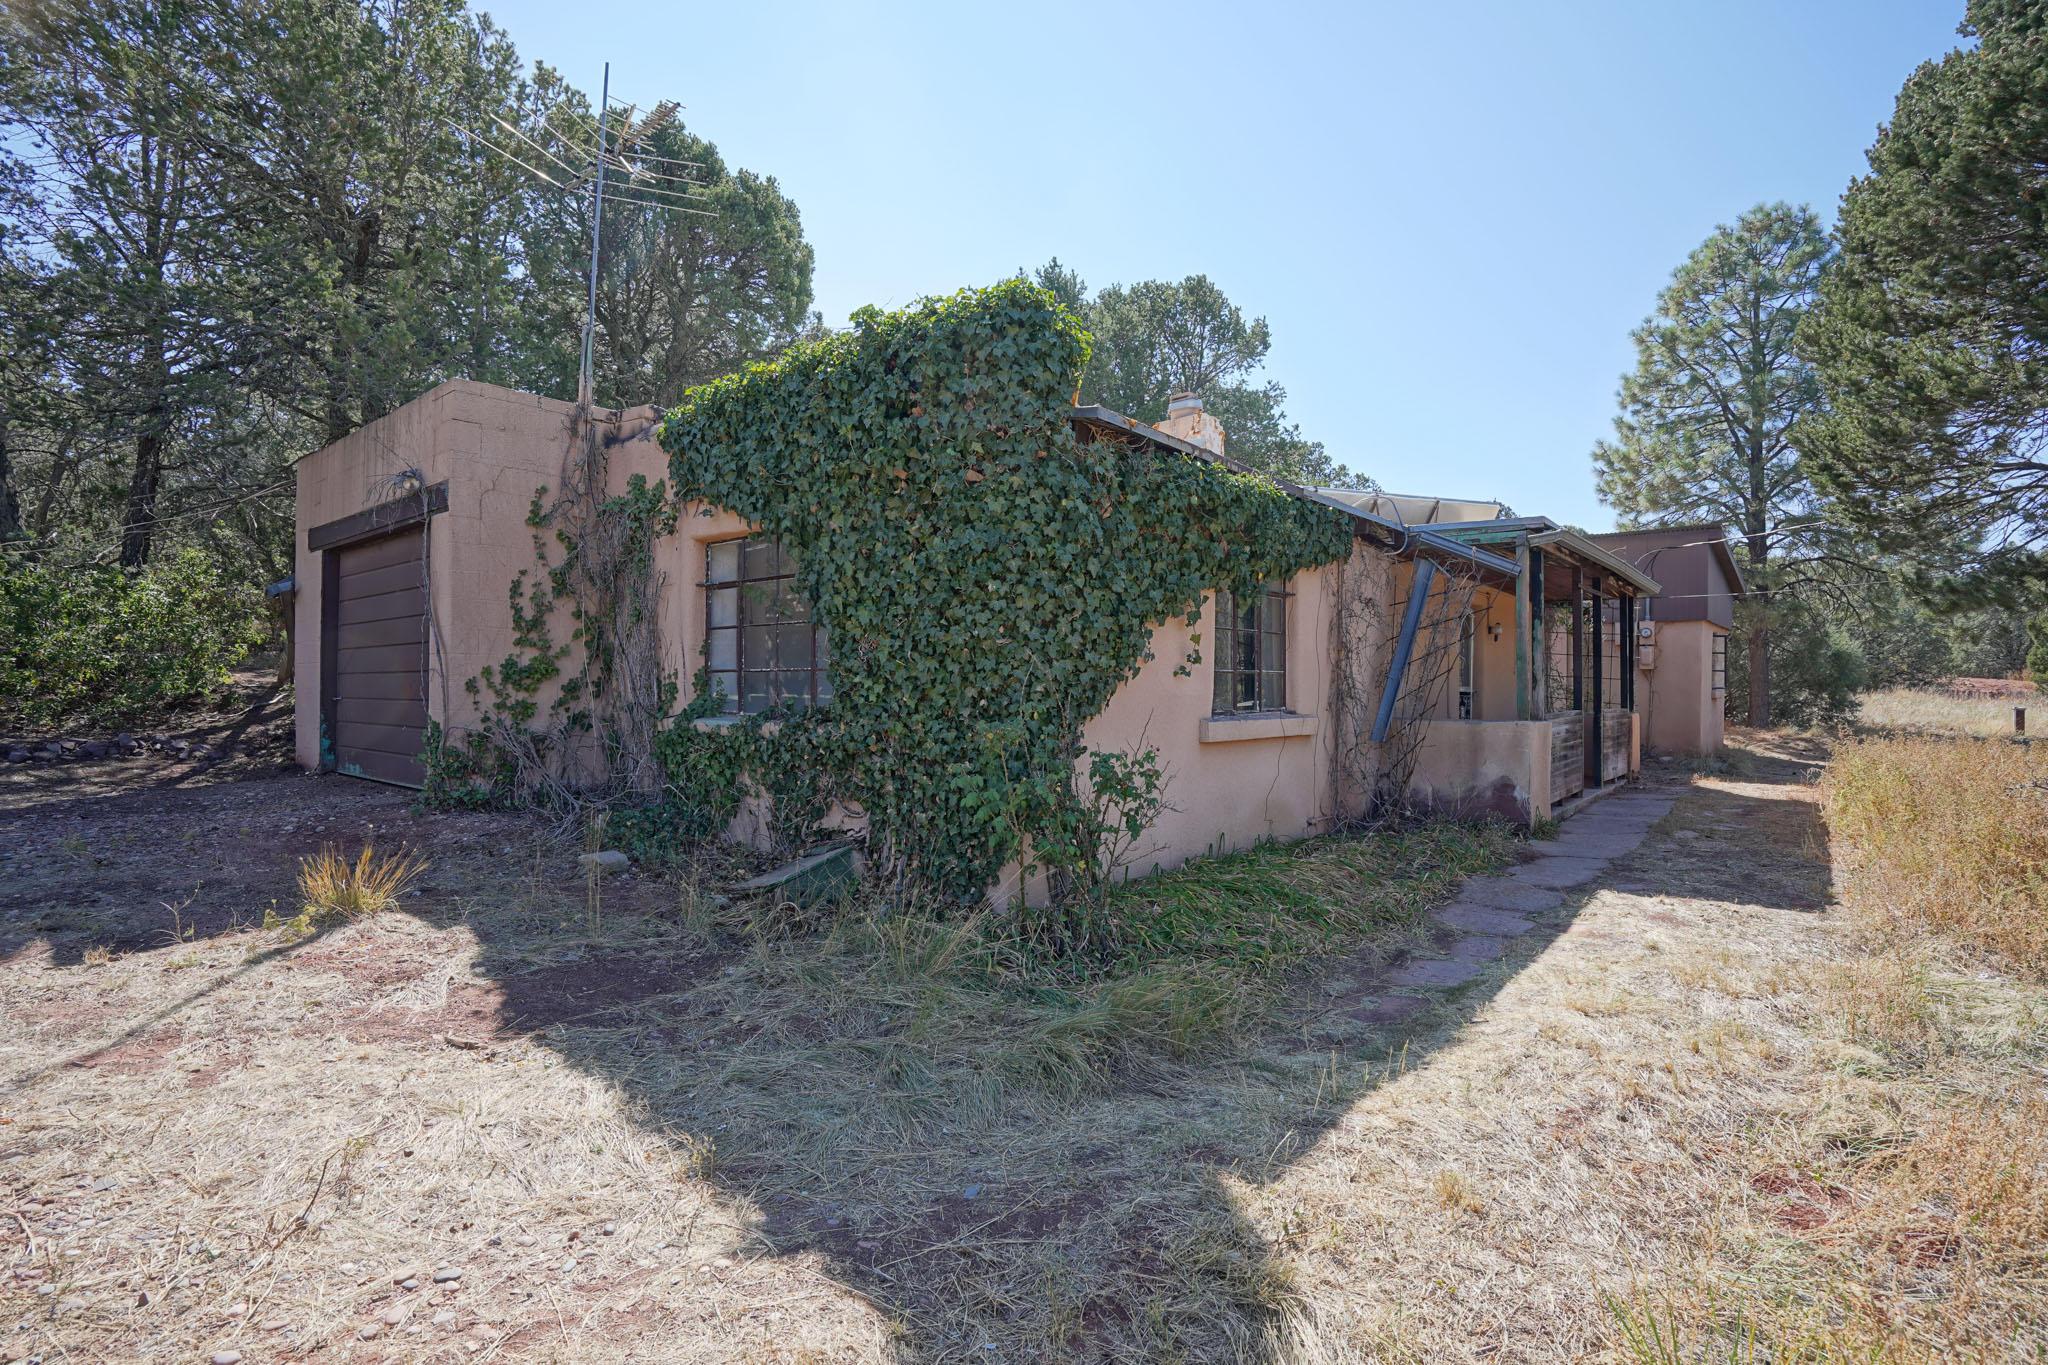 12371 N Highway 14 Property Photo - Cedar Crest, NM real estate listing